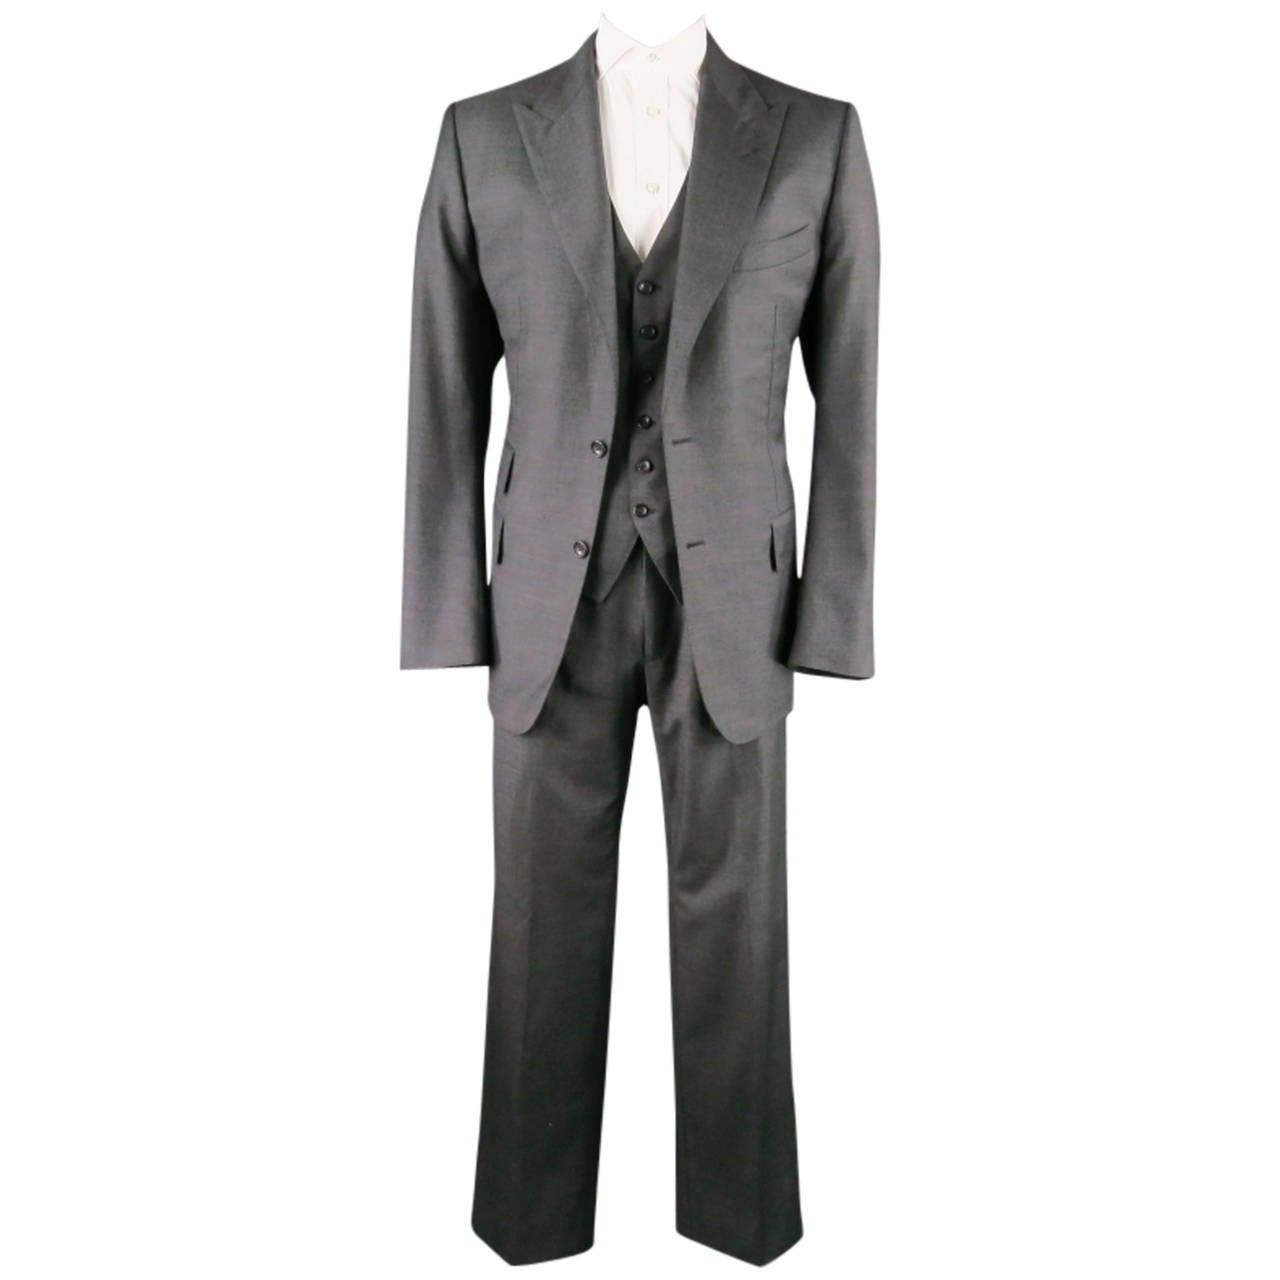 TOM FORD Men's 46 Long Dark Gray Wool Peak Lapel 33 34 3 Piece ...